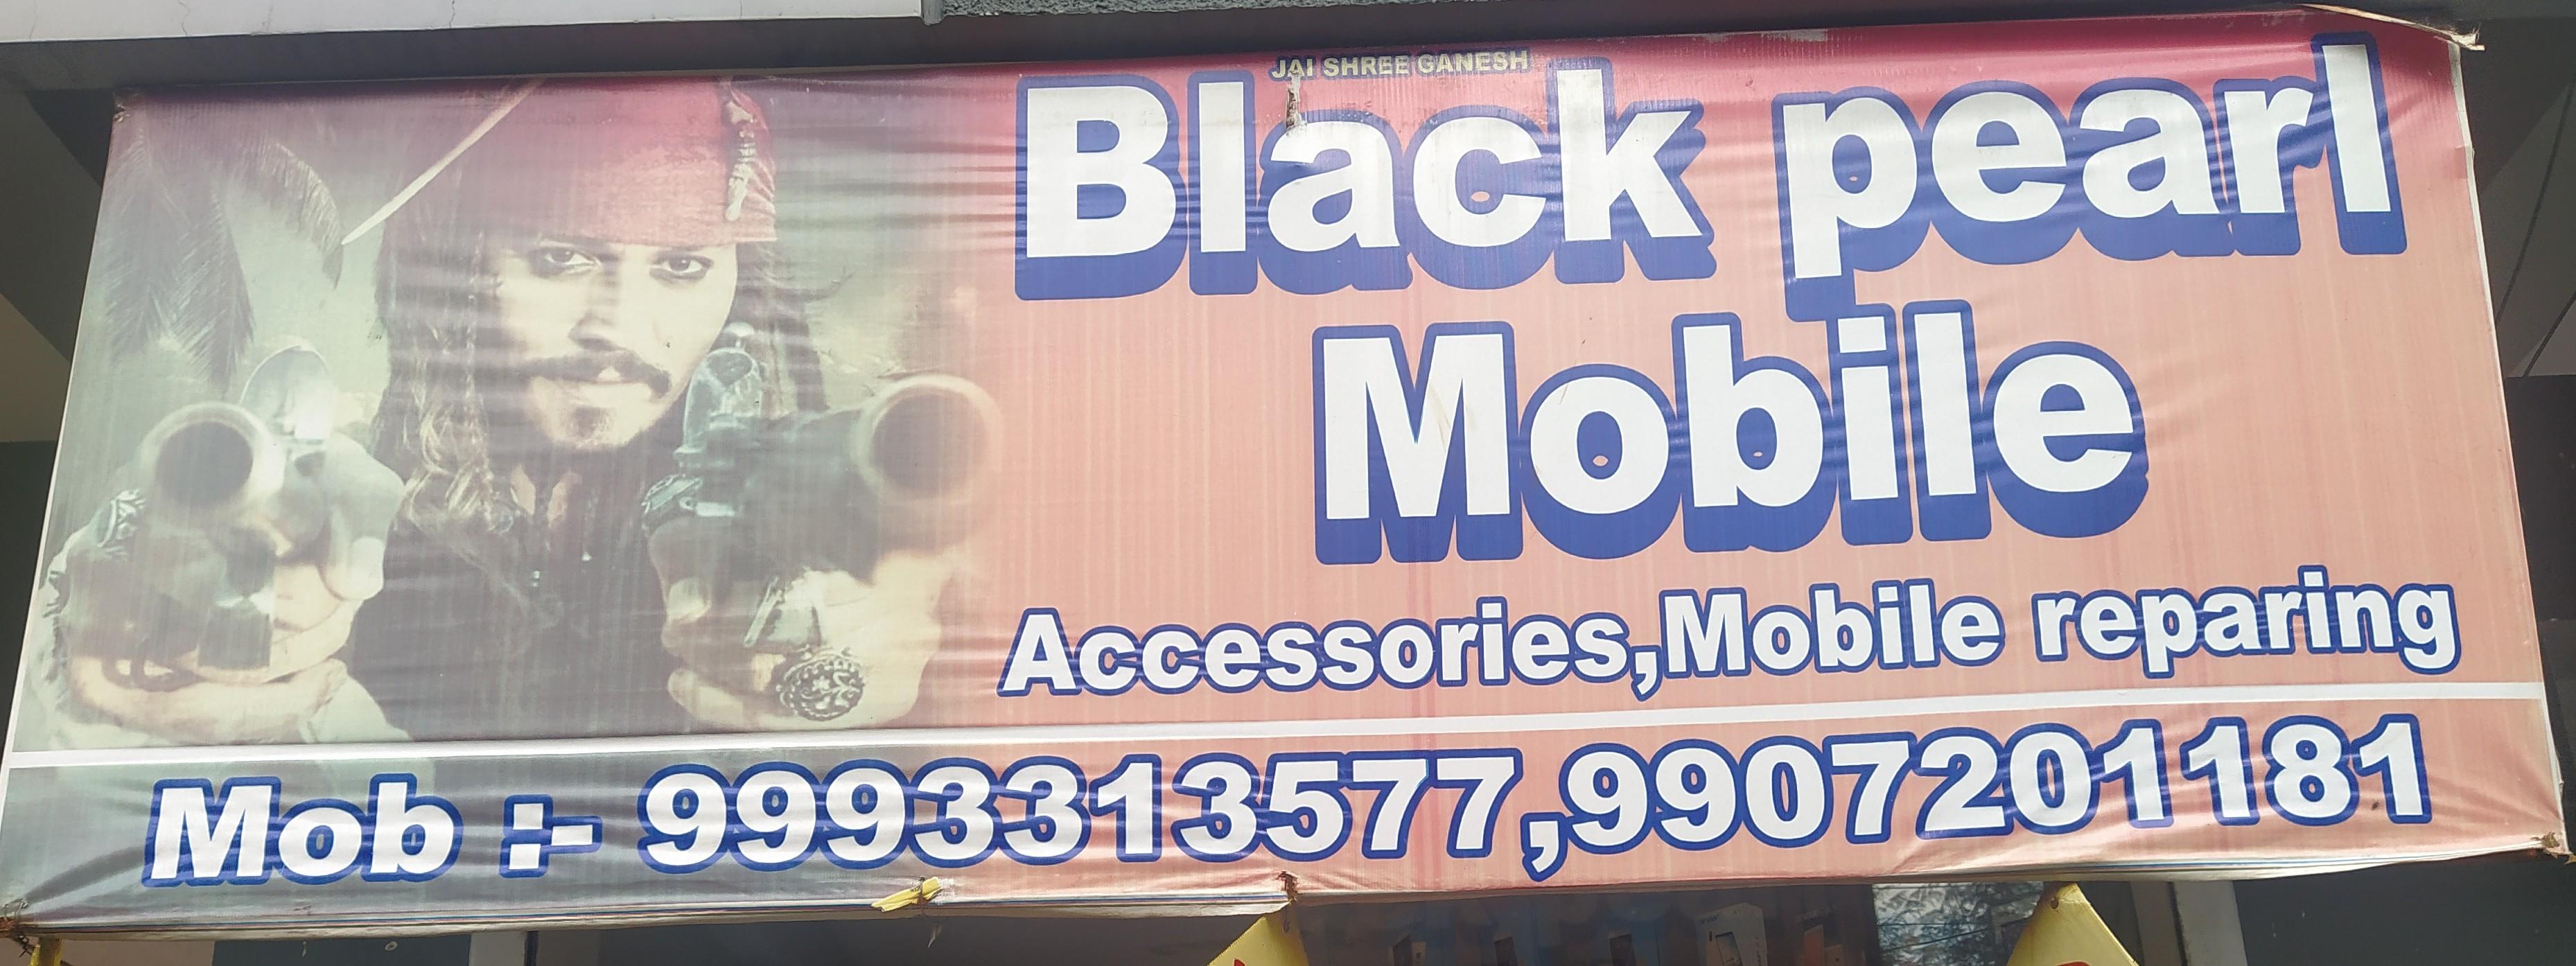 Black Pearl mobile